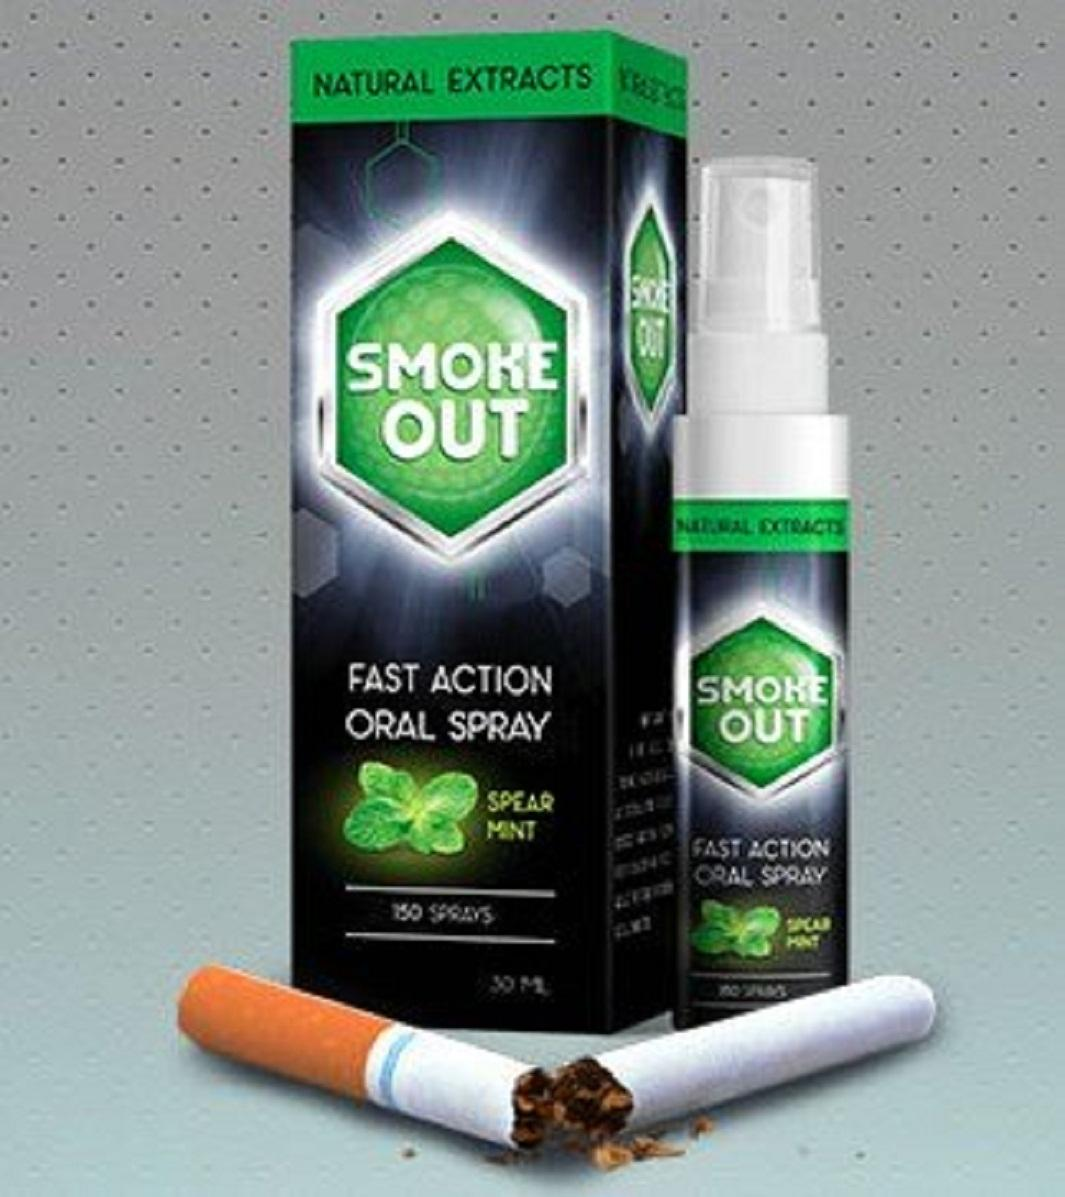 Xịt Cai Nghiện Thuốc Lá Smoke Out fast action oral spray 30ml